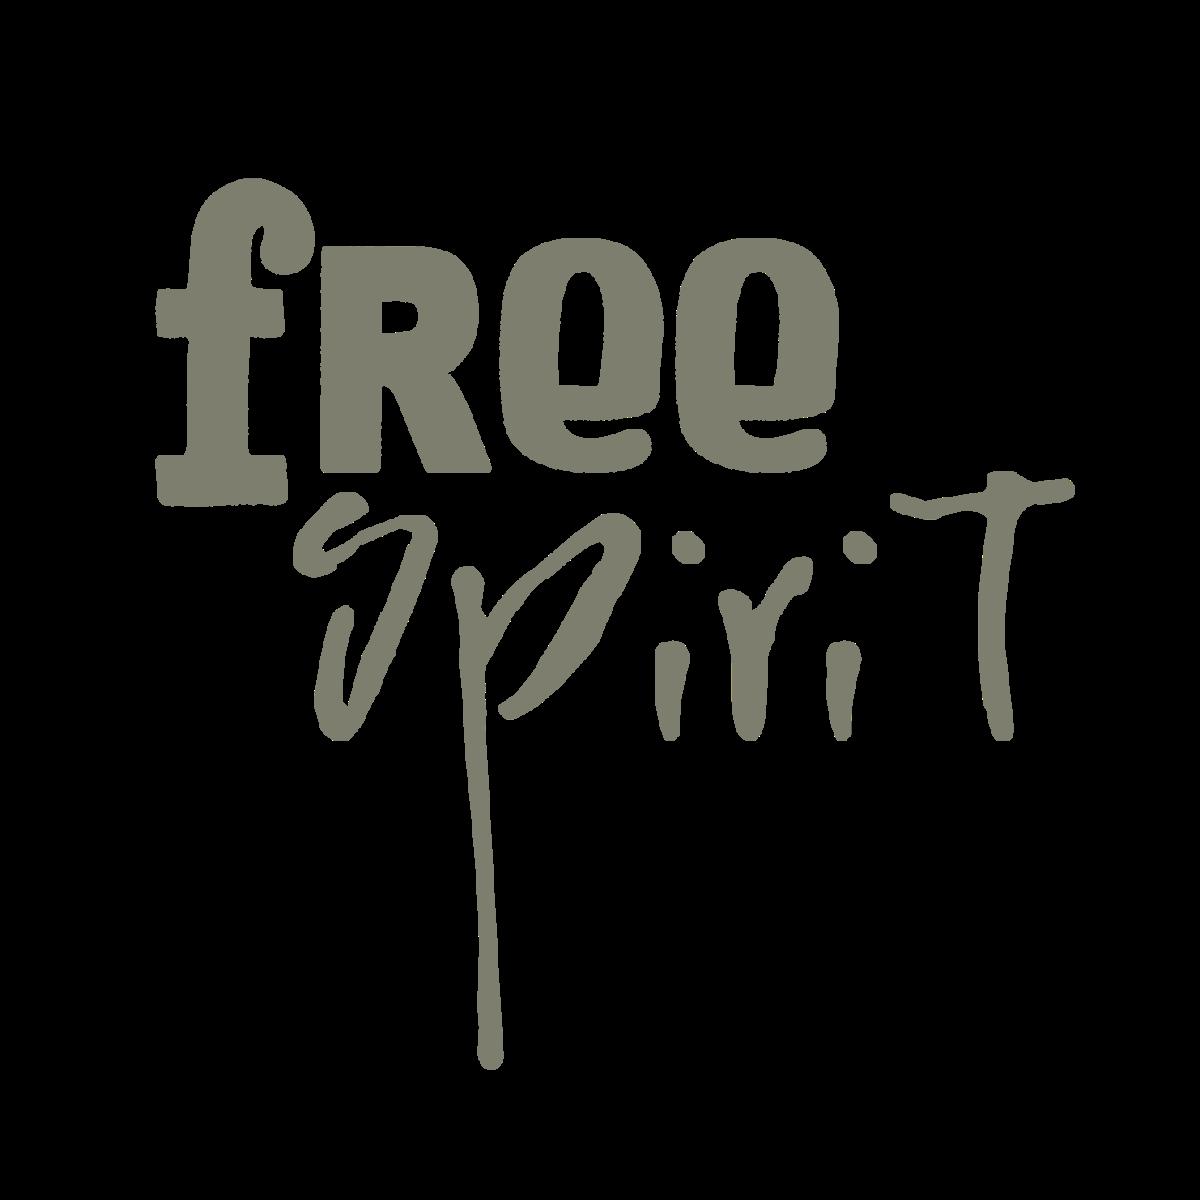 marisa-lerin-free-spirit-word-art-asset-words-commercial-use